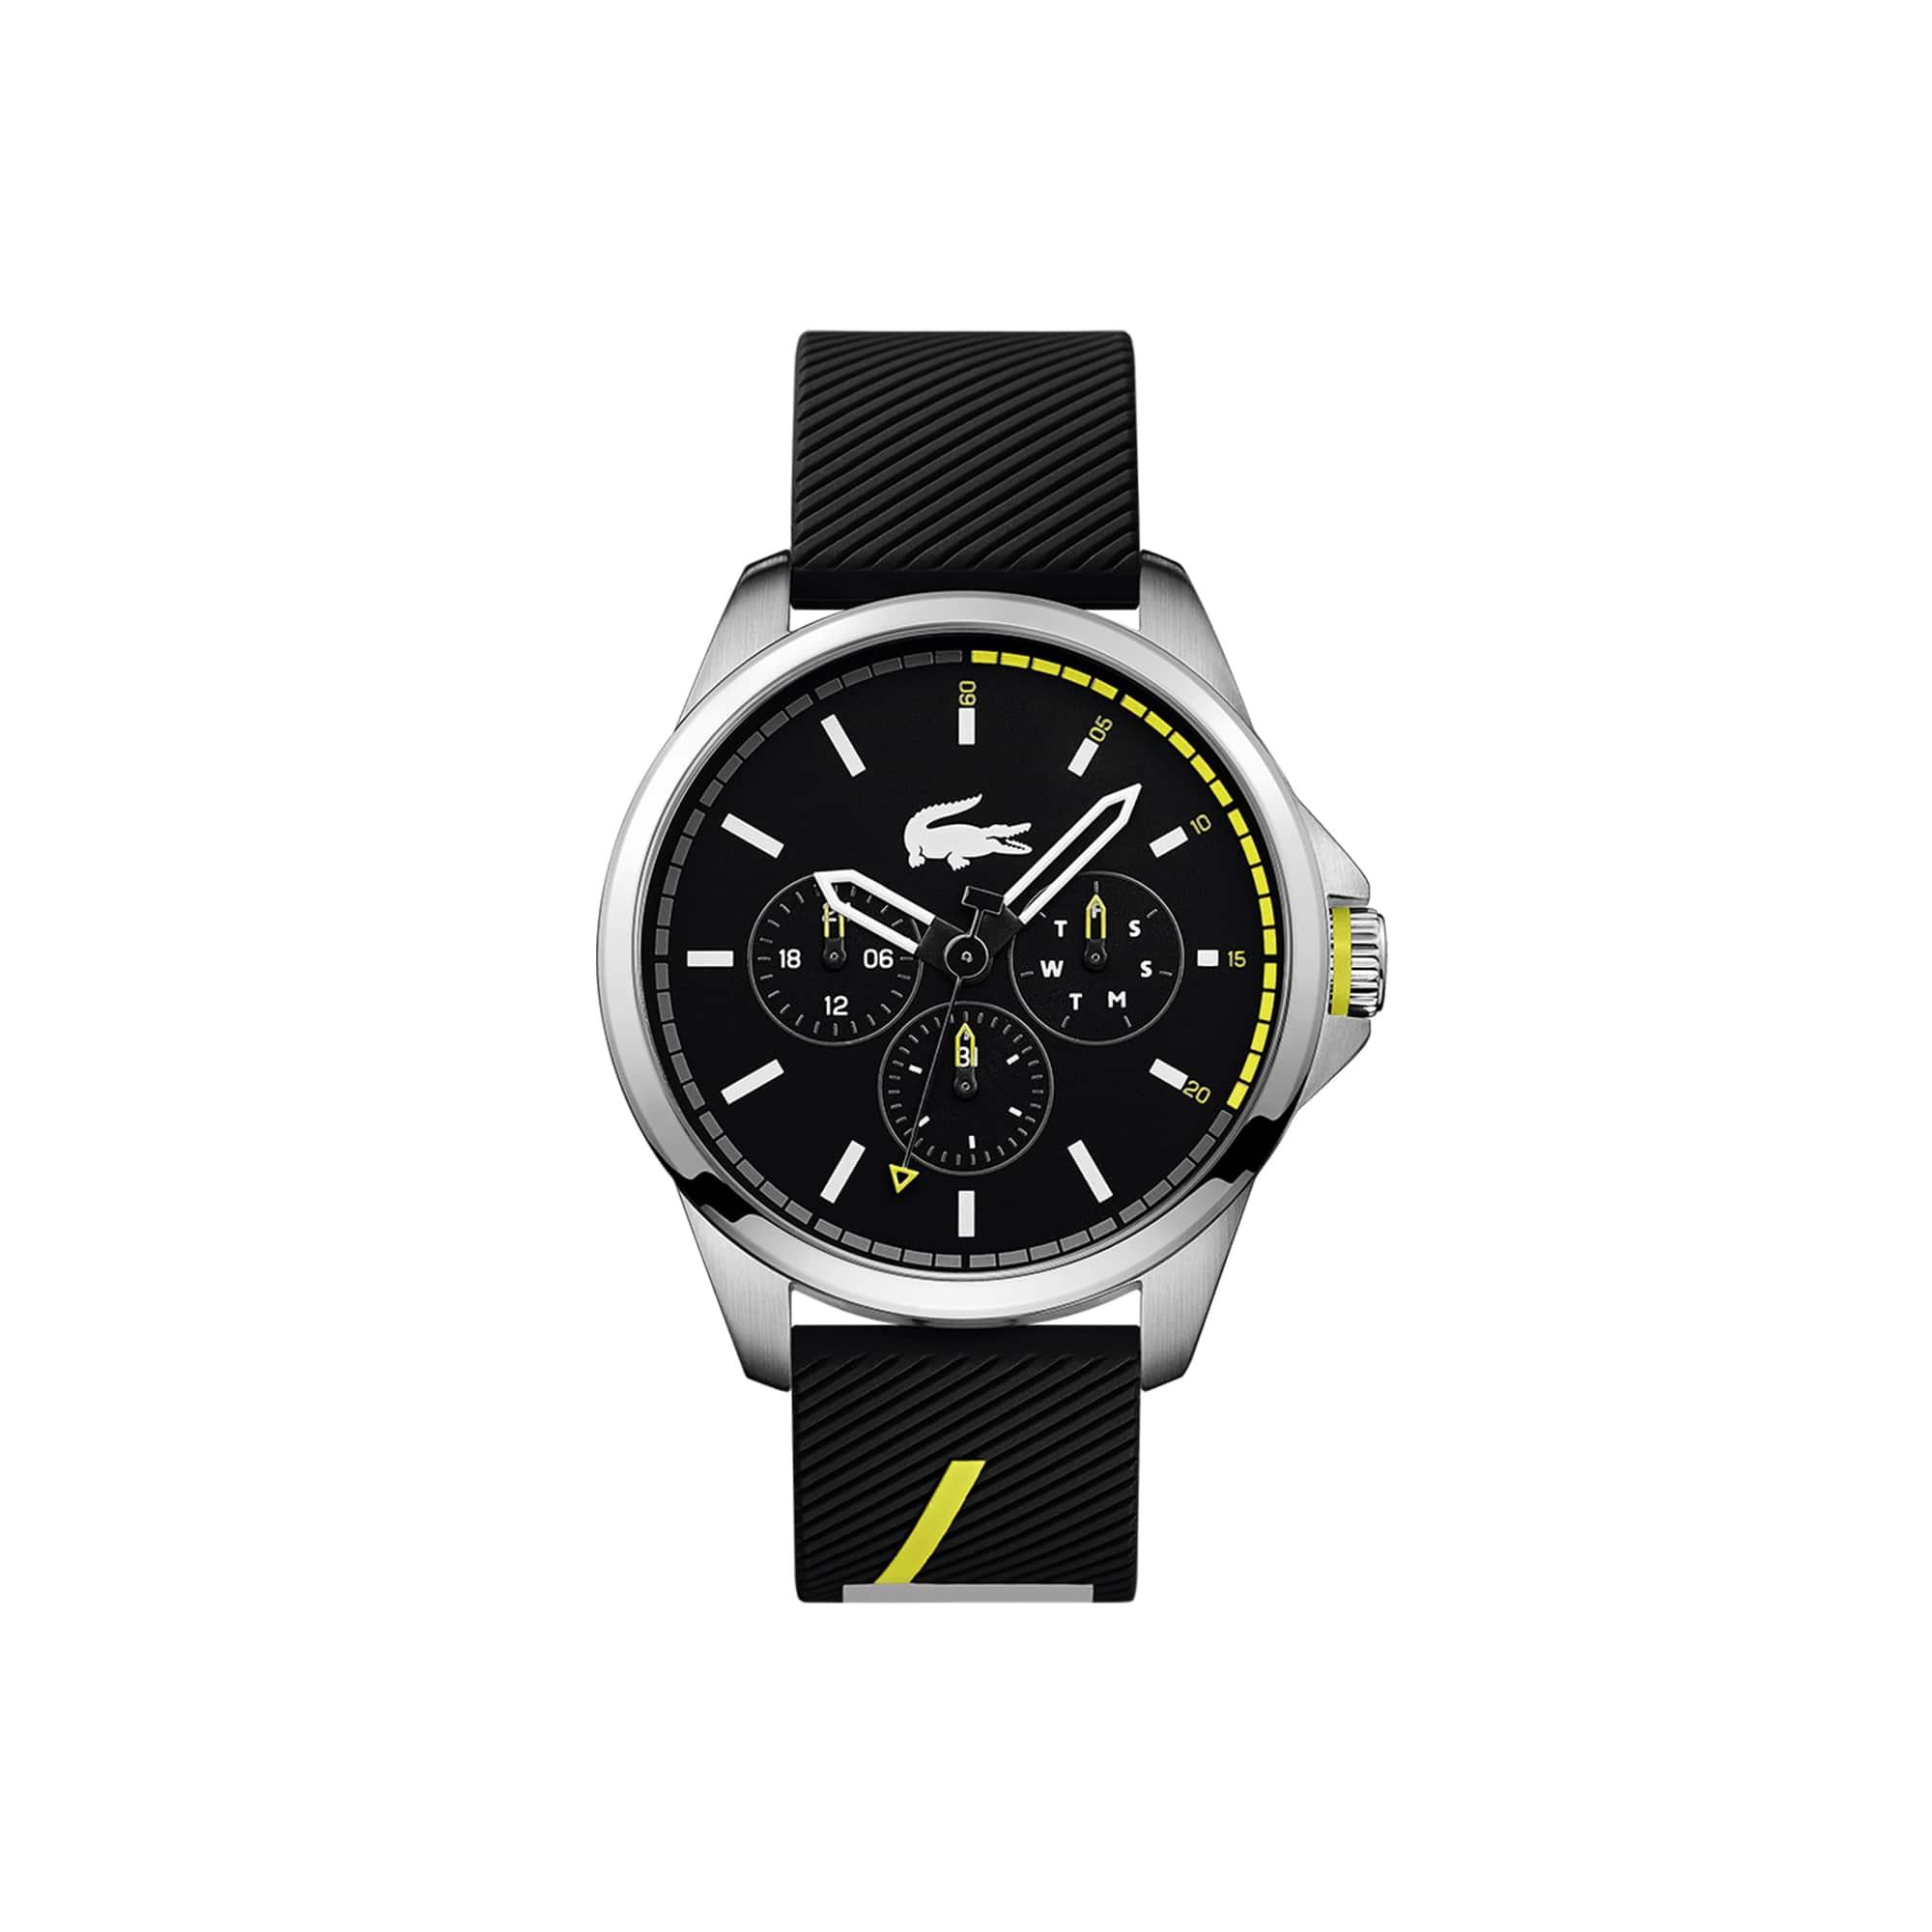 Men's Capbreton Multifunctions Watch with Black Silicone Strap